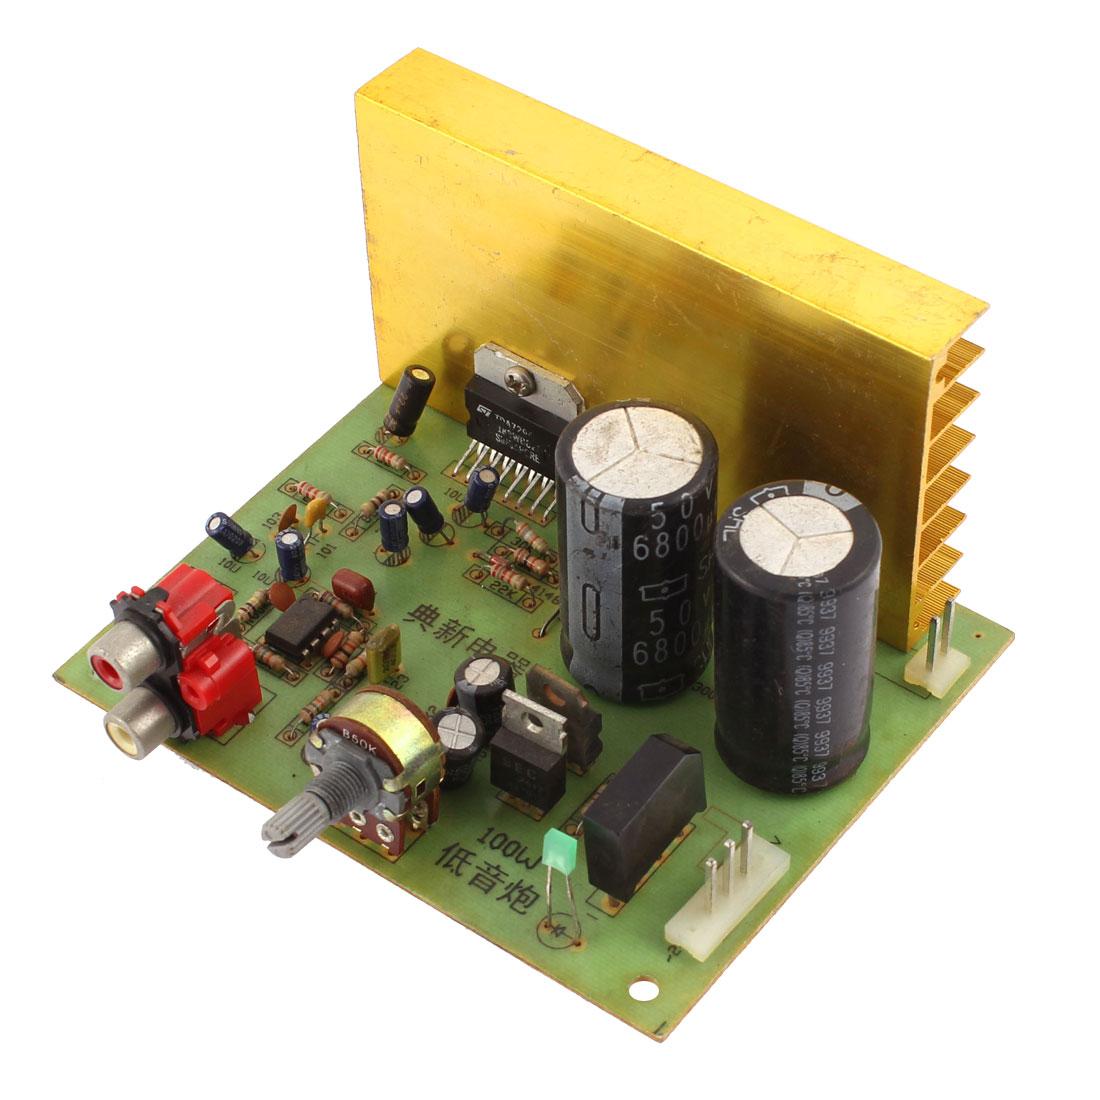 DC 12V 100W LFE Subwoofer Audio Hi-Fi 2 Channel Car Boat Stereo Power Amplifier